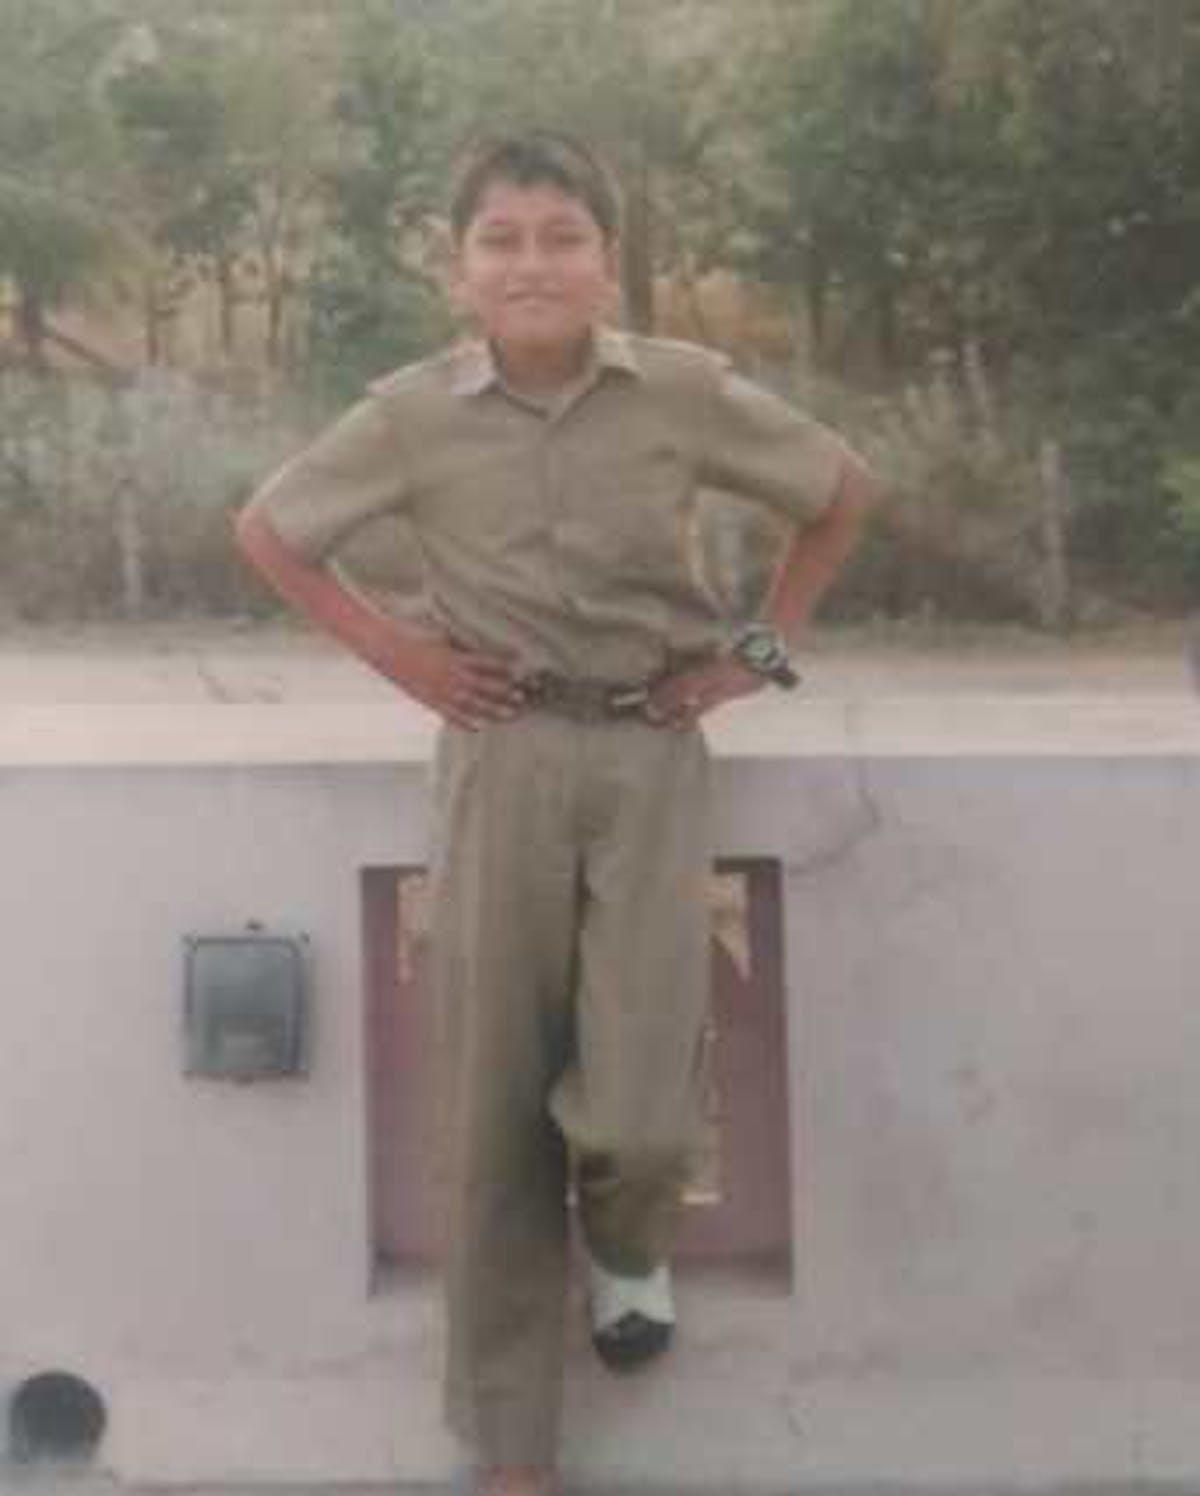 Boy in school uniform